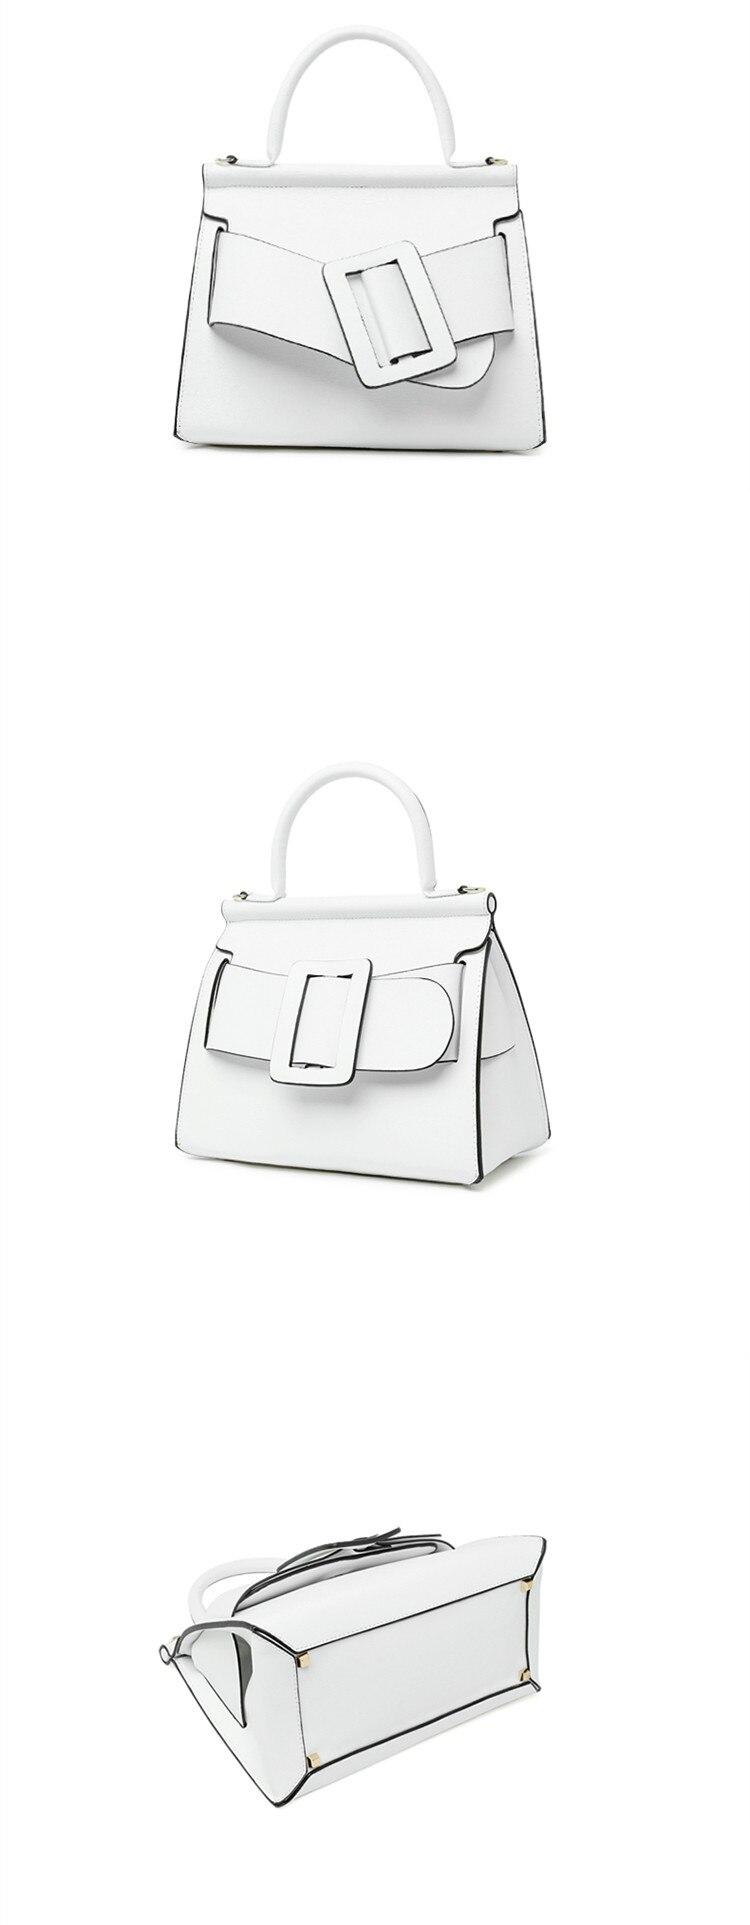 Famous Brand Designer Handbag Genuine Leather Women Vintage Bark Grain Big Buckle Handle bags with strap belt Boyy (11)_